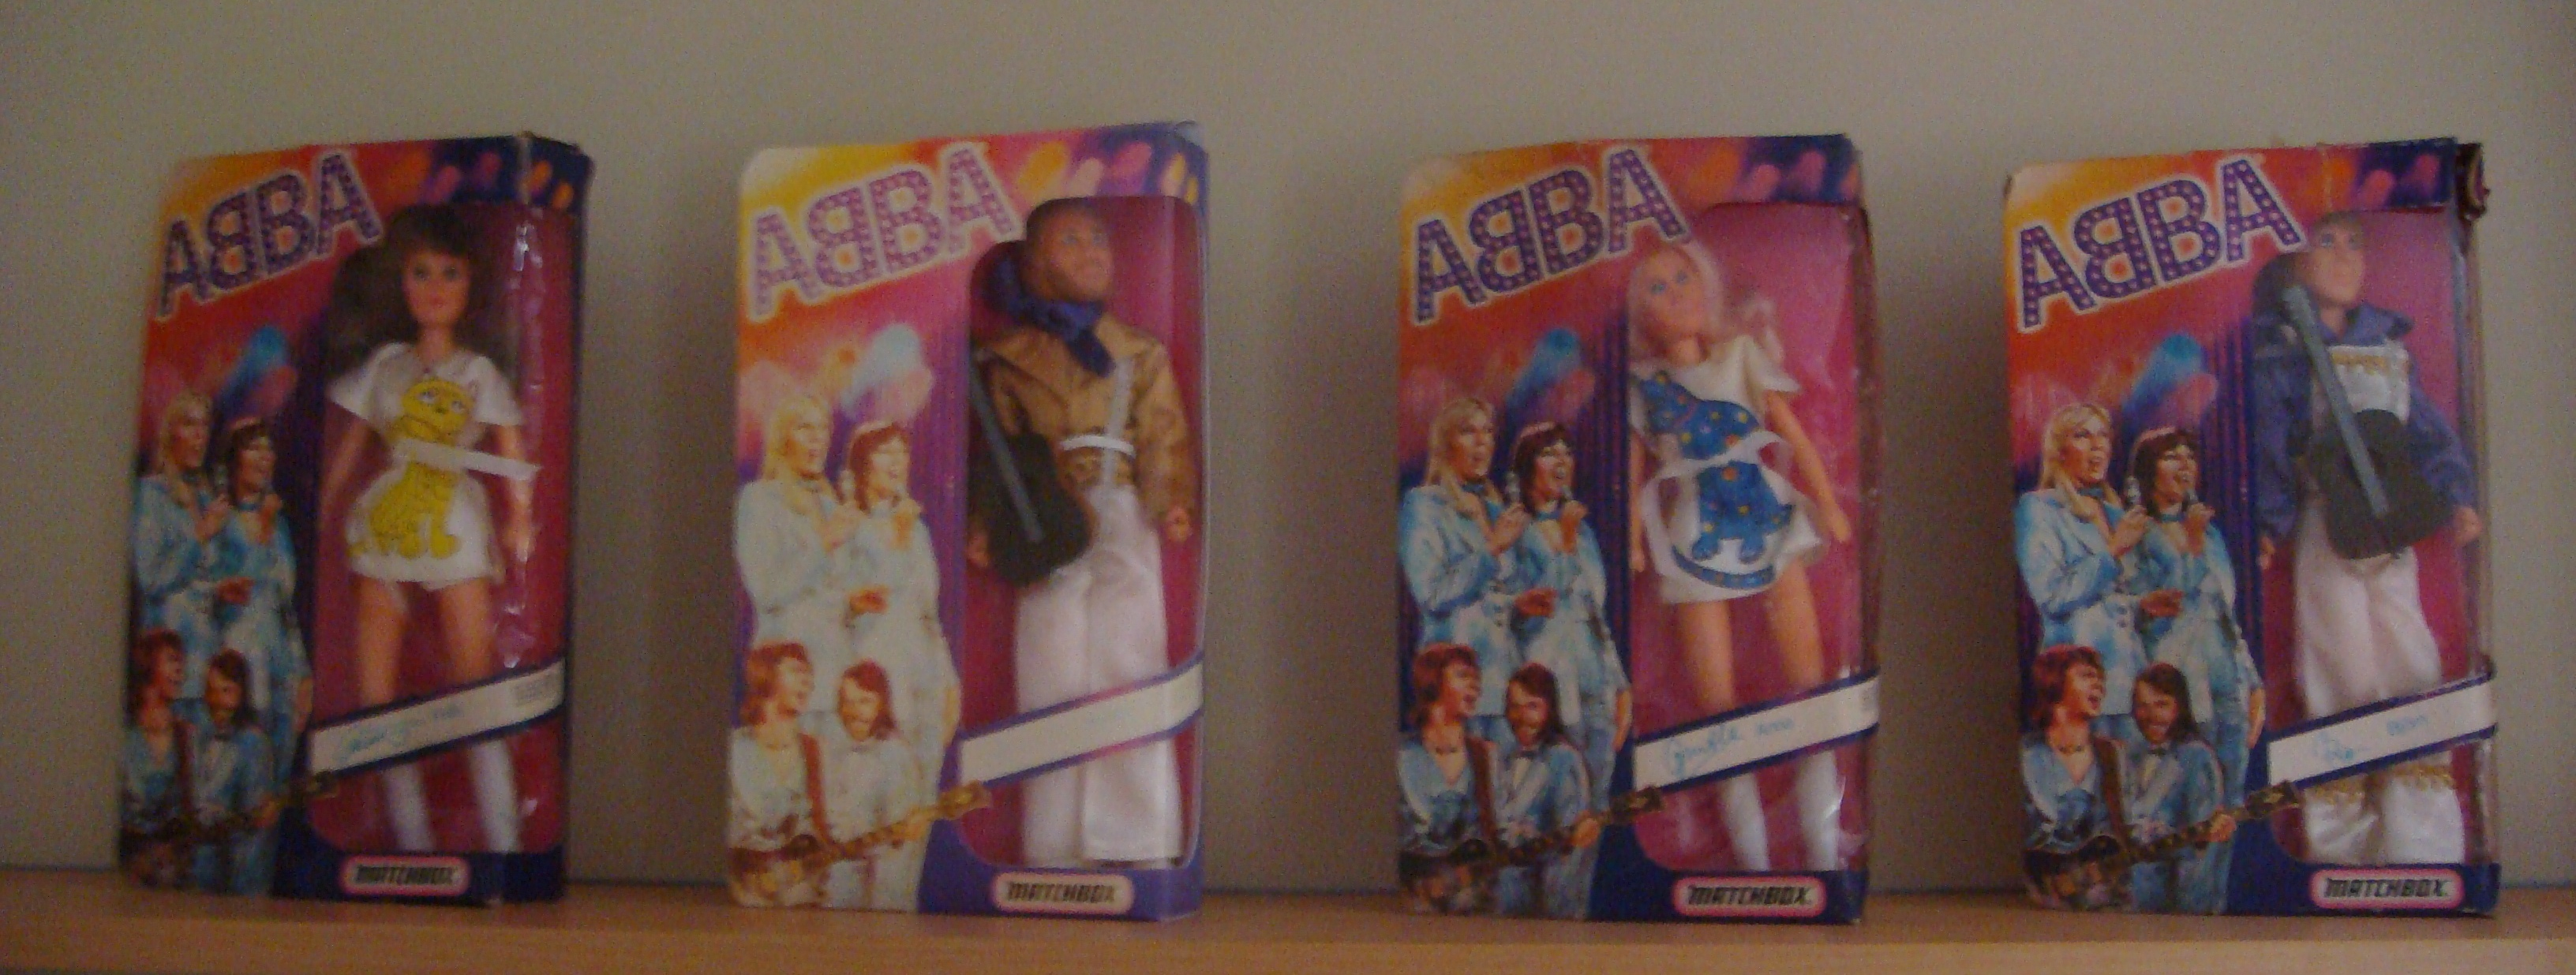 set of 4 dolls.jpg